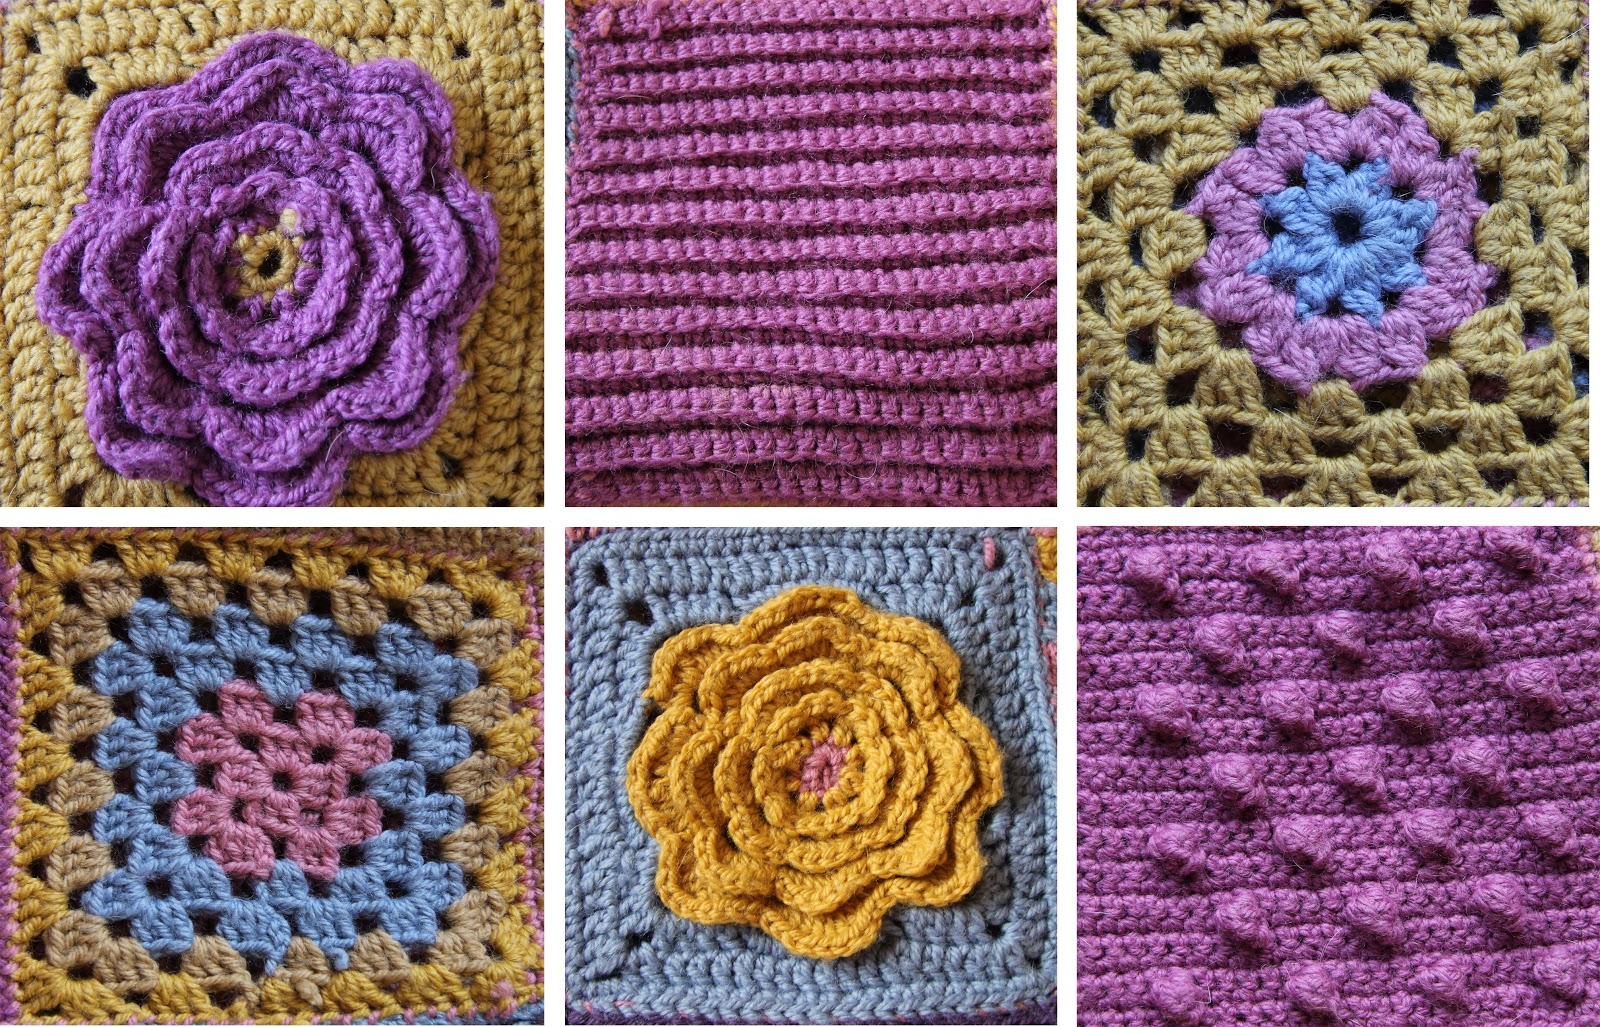 Susimiu manta crochet popurri de muestras - Mantas lana ganchillo ...